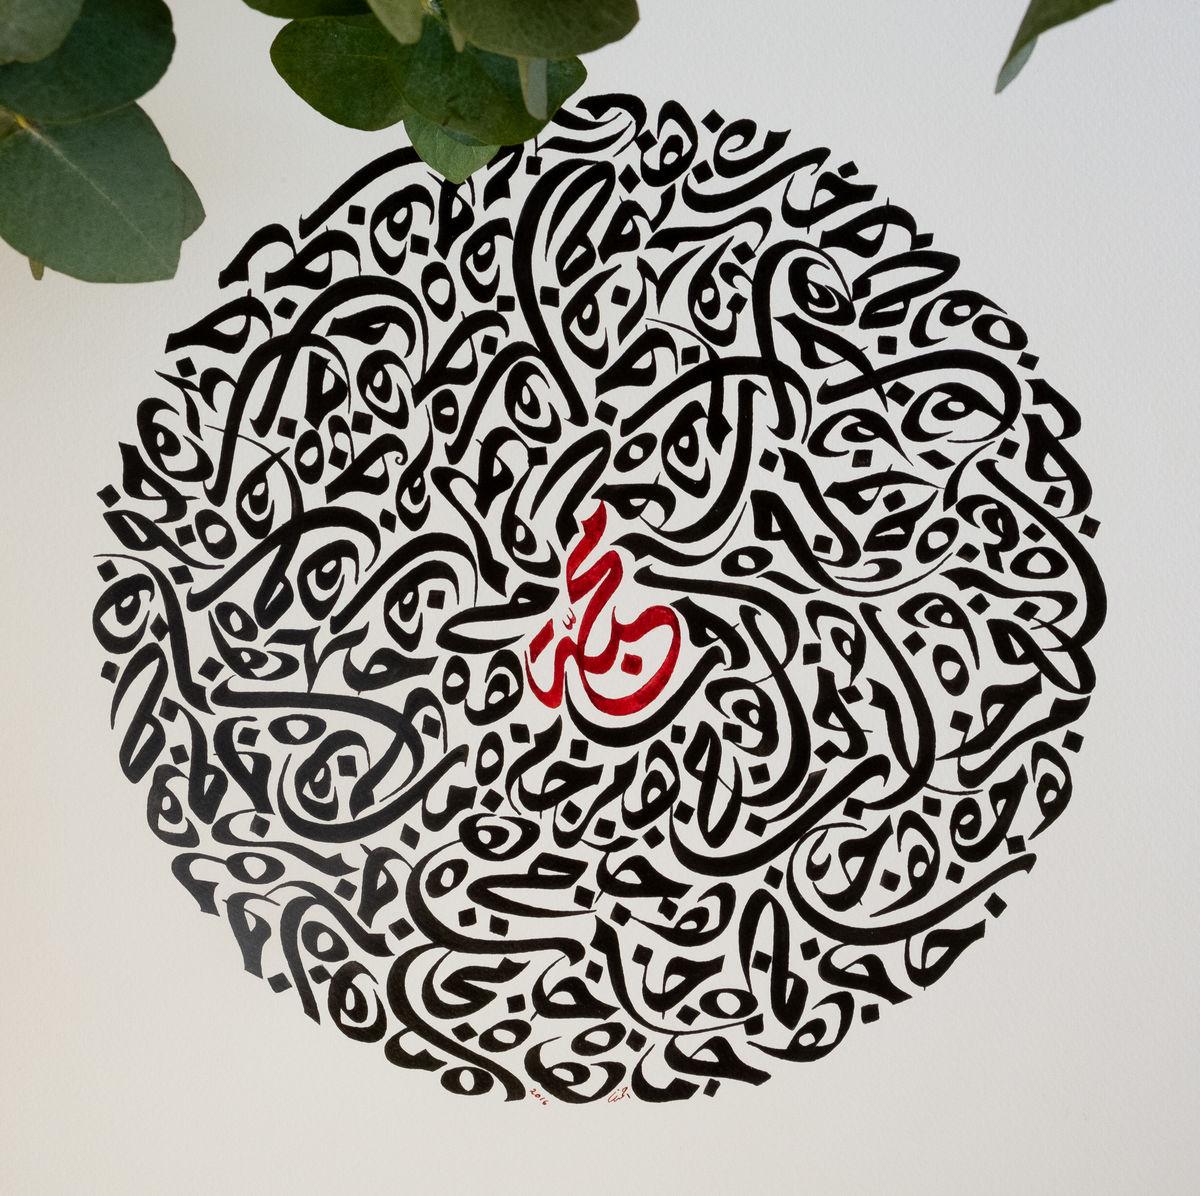 Arabic Calligraphy Art Print Love By Artist Calligrapher Ahmad Zoabi El Bustan